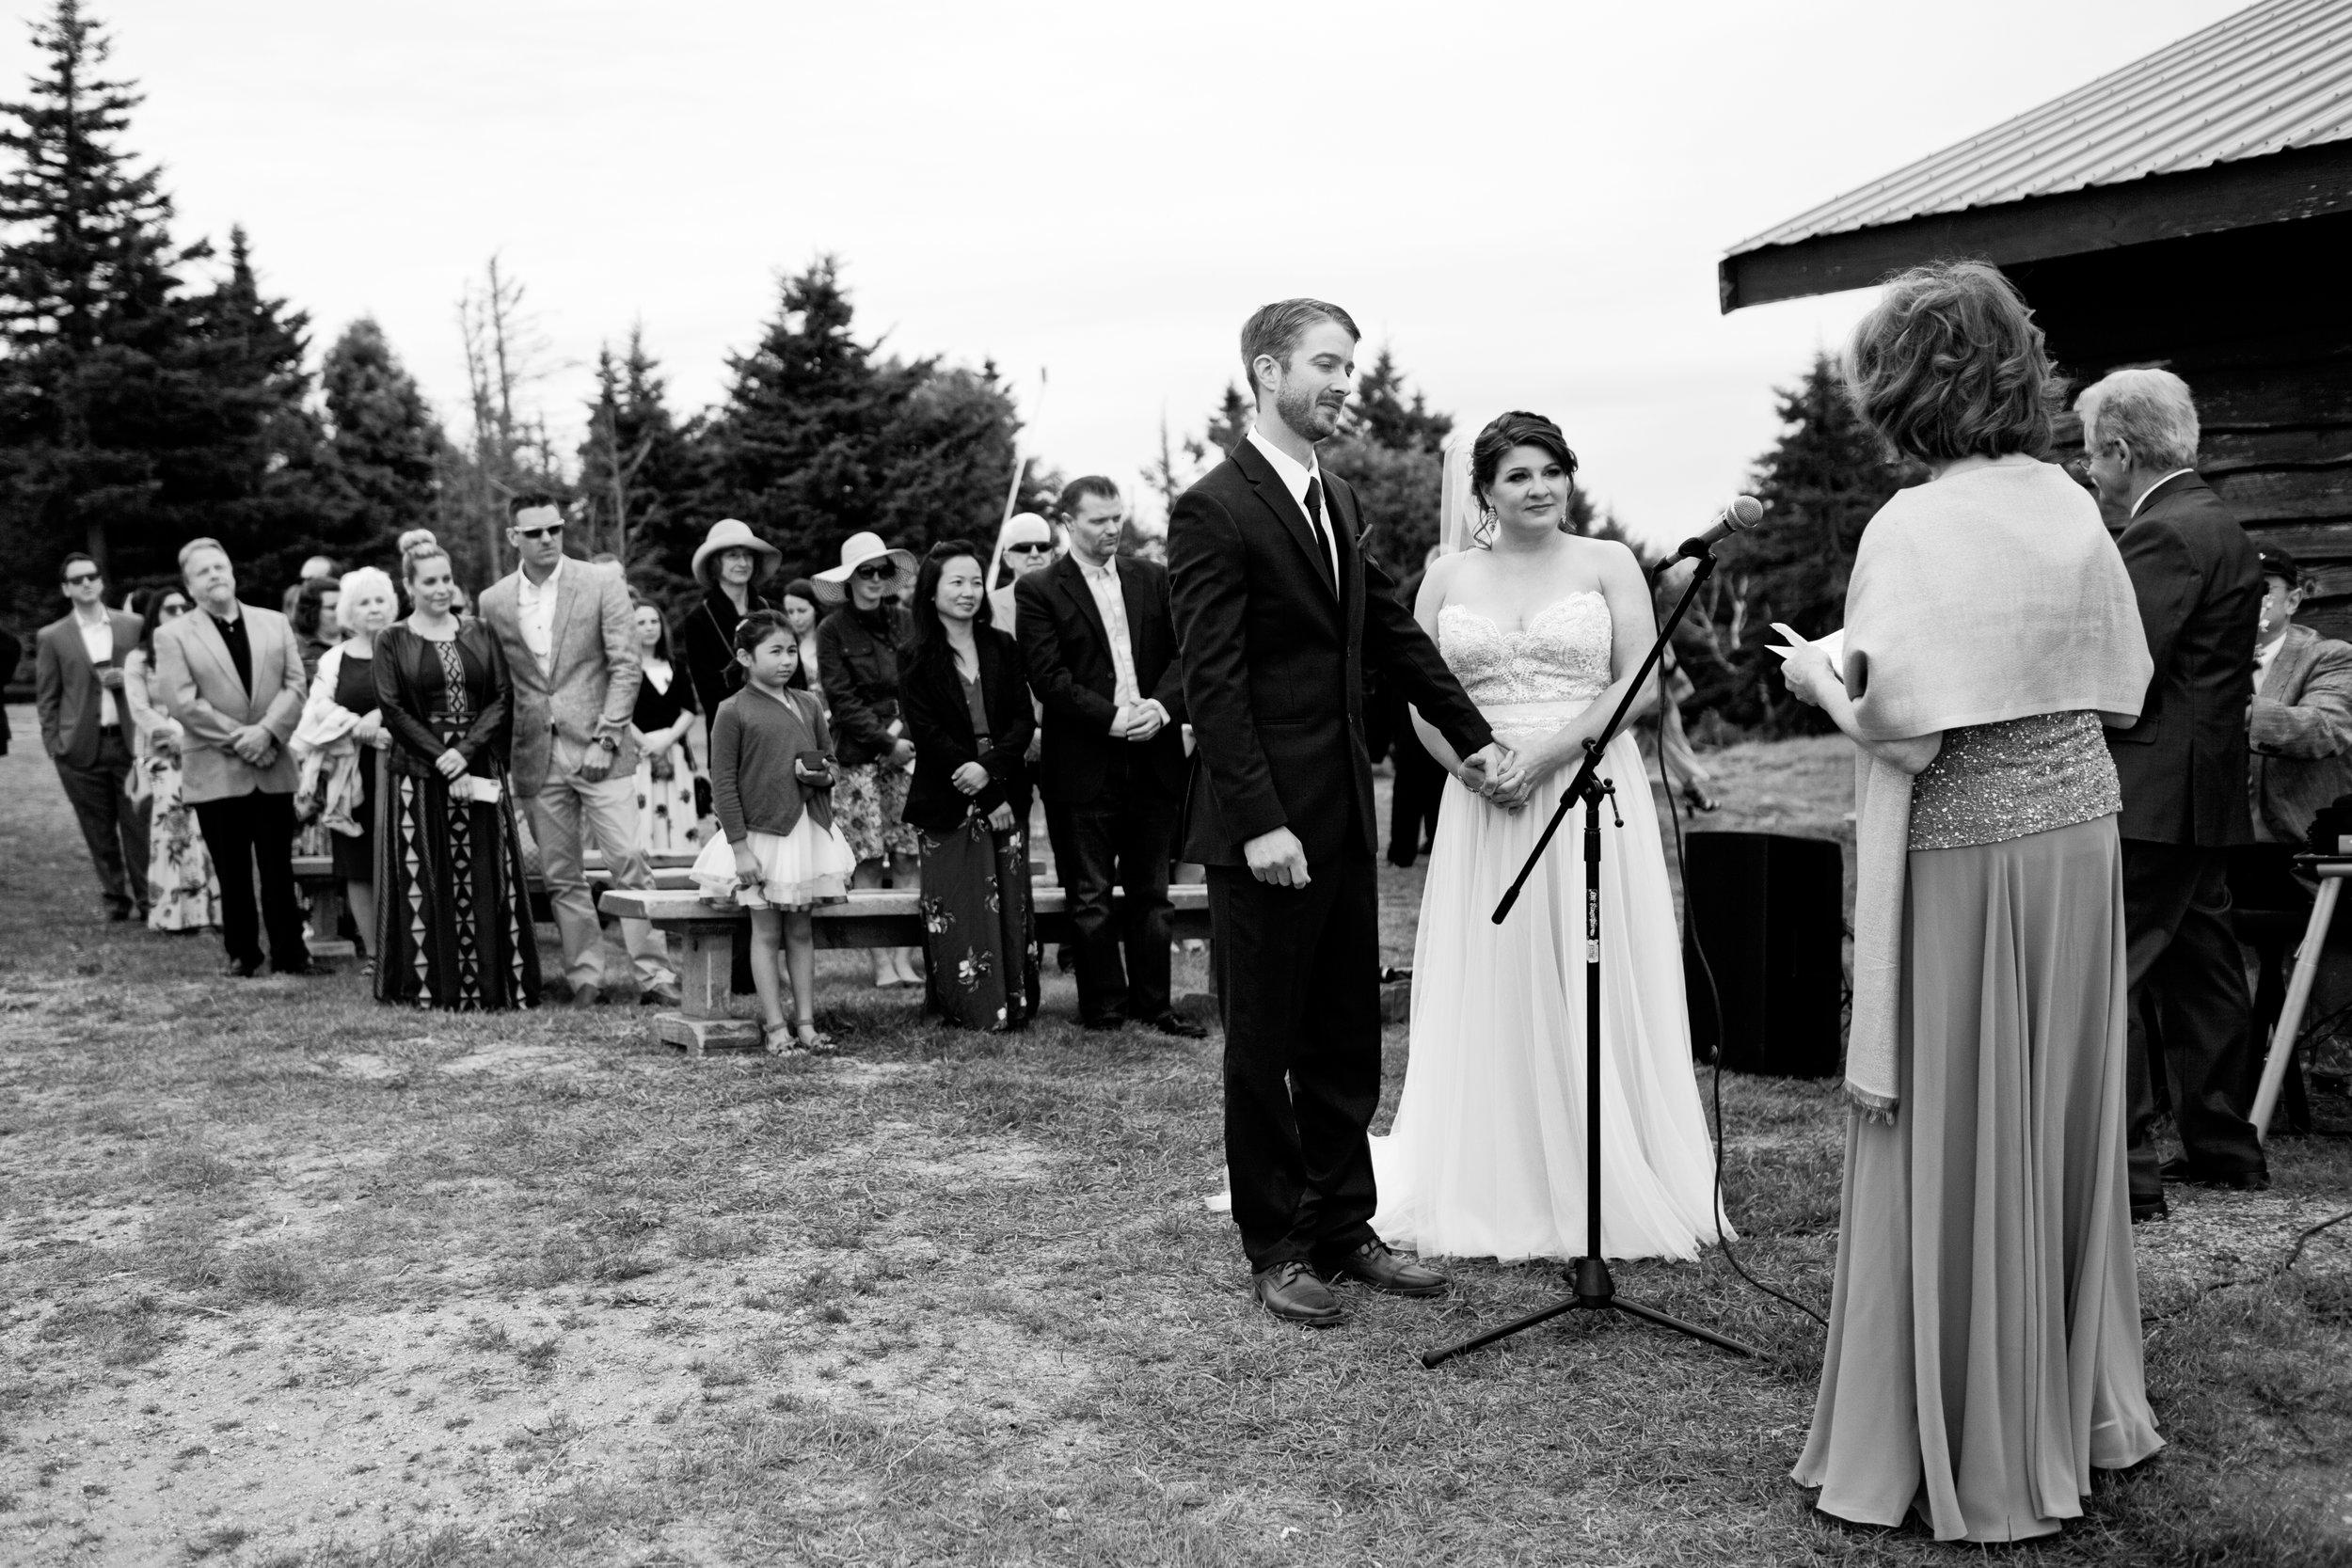 gunstock-mountain-resort-wedding-photos-14.JPG